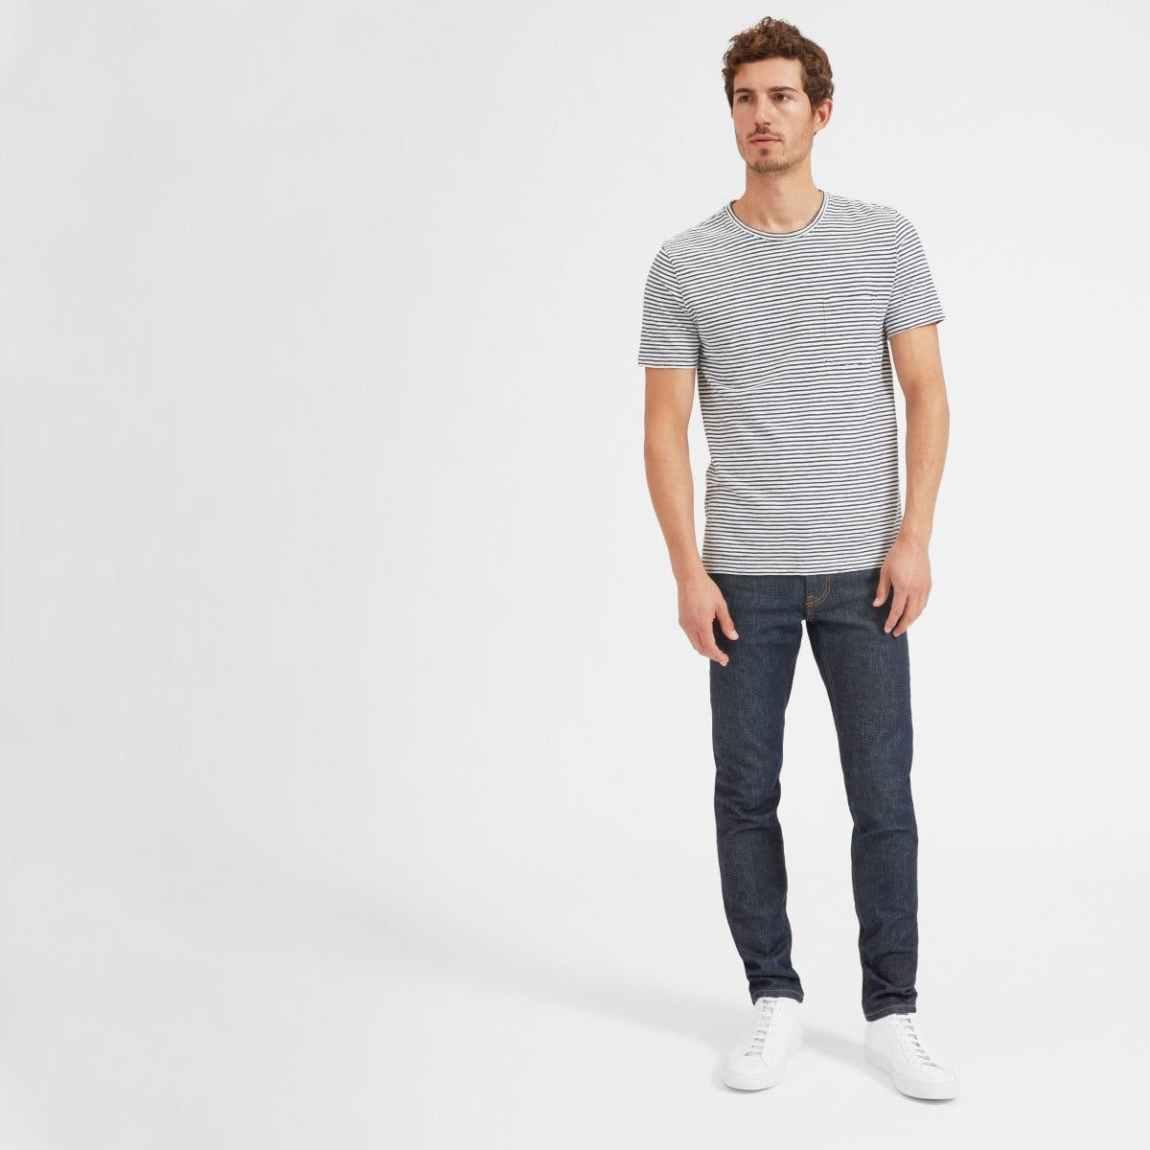 everlane, everlane jeans, everlane denim, japanese denim, slim jeans, raw jeans, straight jeans, denimblog, denim blog